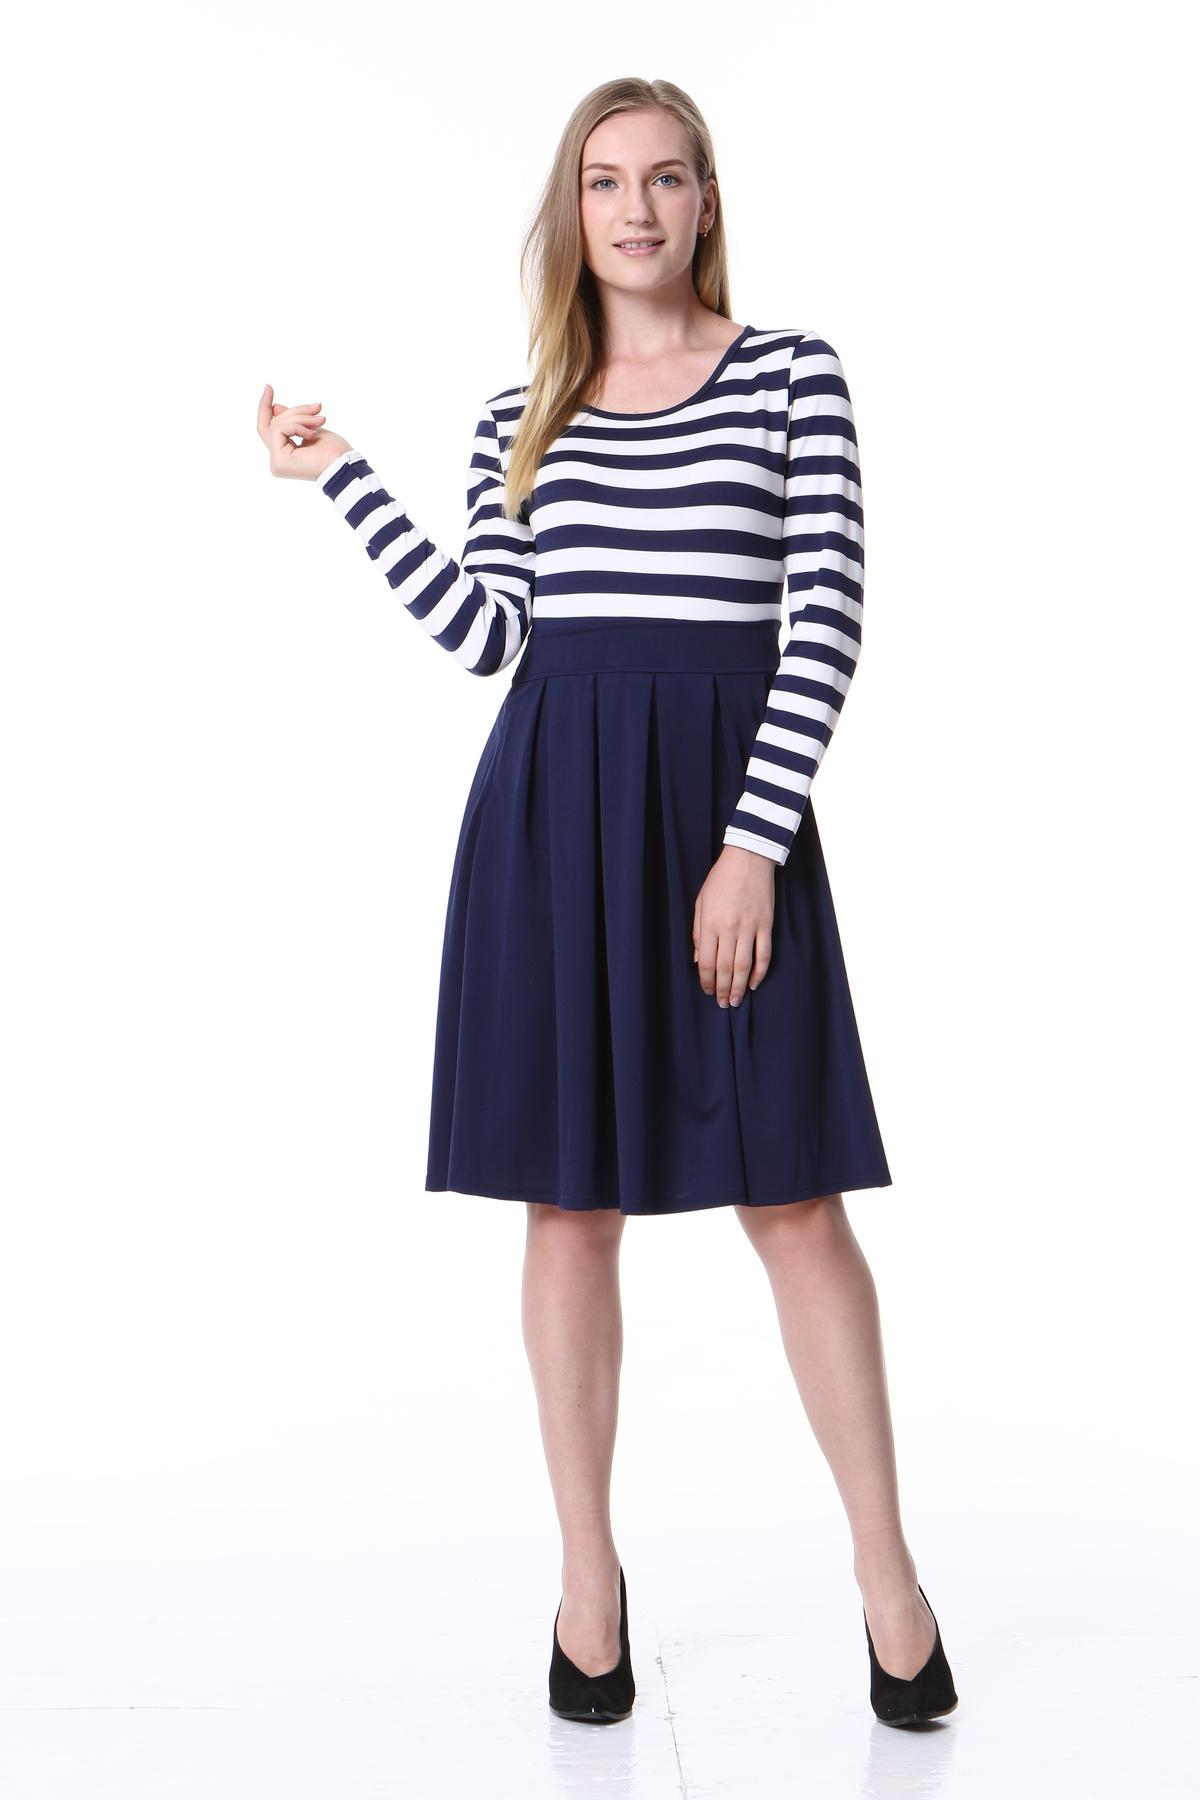 e98384990f0d Mixfeer Women S Casual Striped Dress Vintage Scoop Neck Long Sleeve Swing Dress  2018 Spring